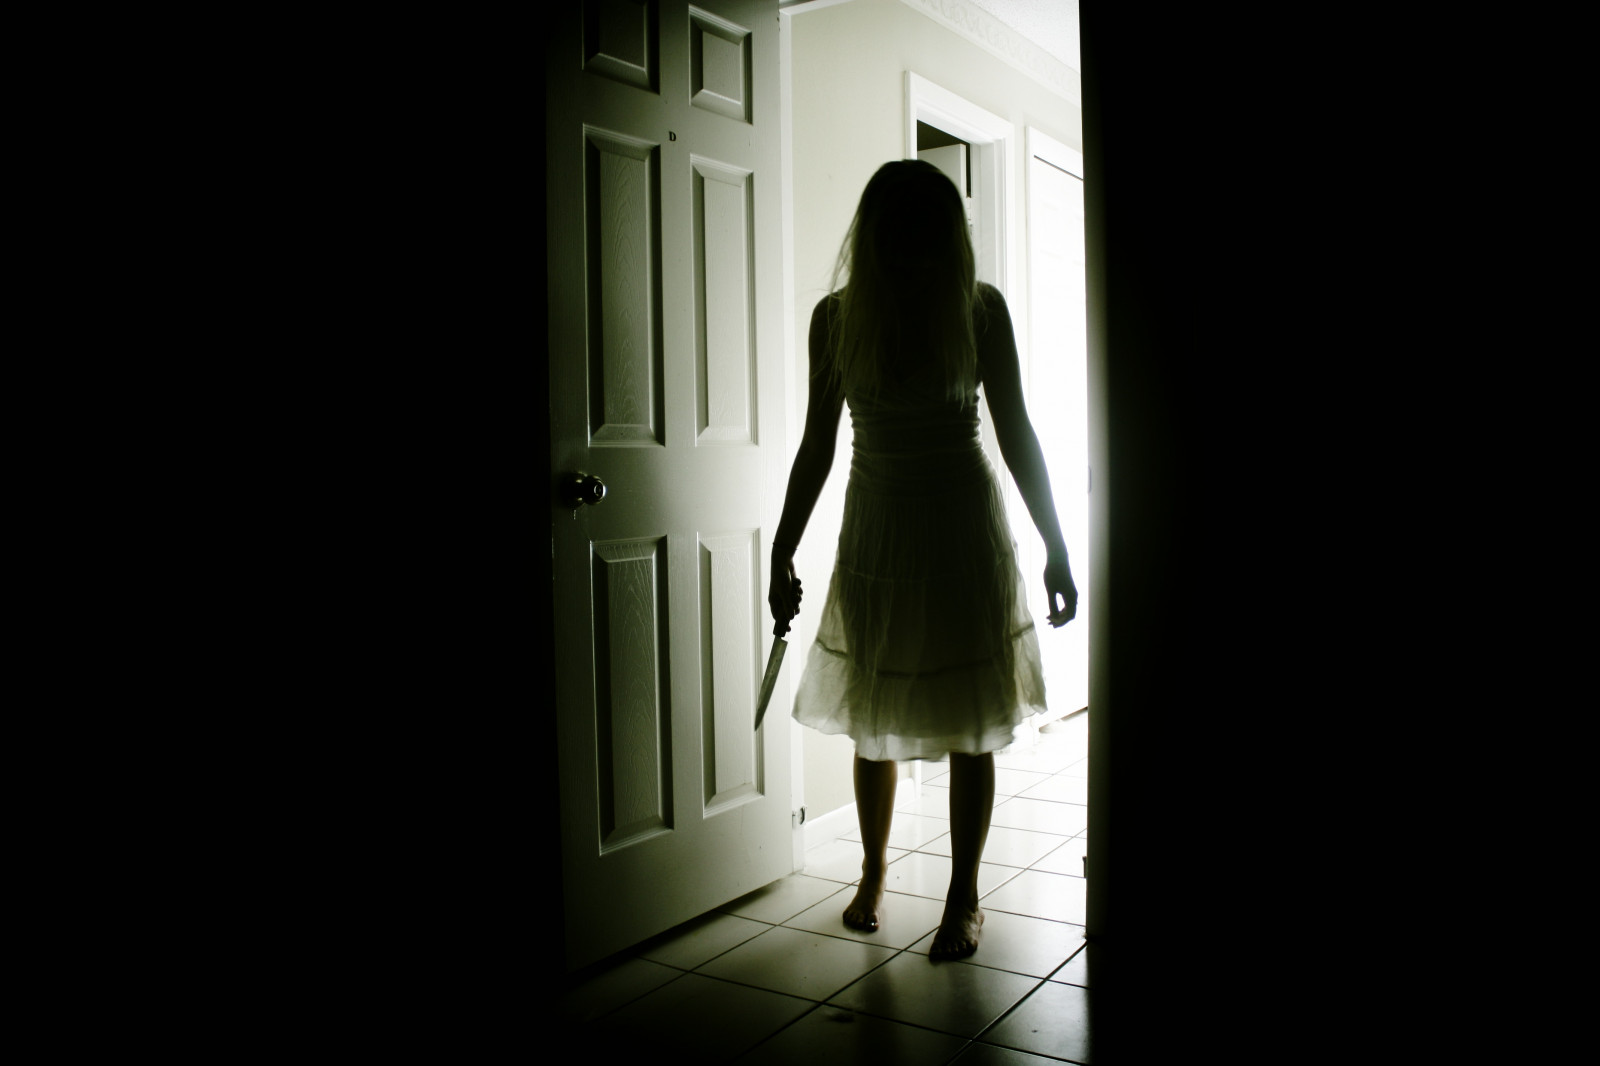 Silhouette Girl Real Wallpaper Wallpaper Creepy Horror Shadow Dress Lamp Standing